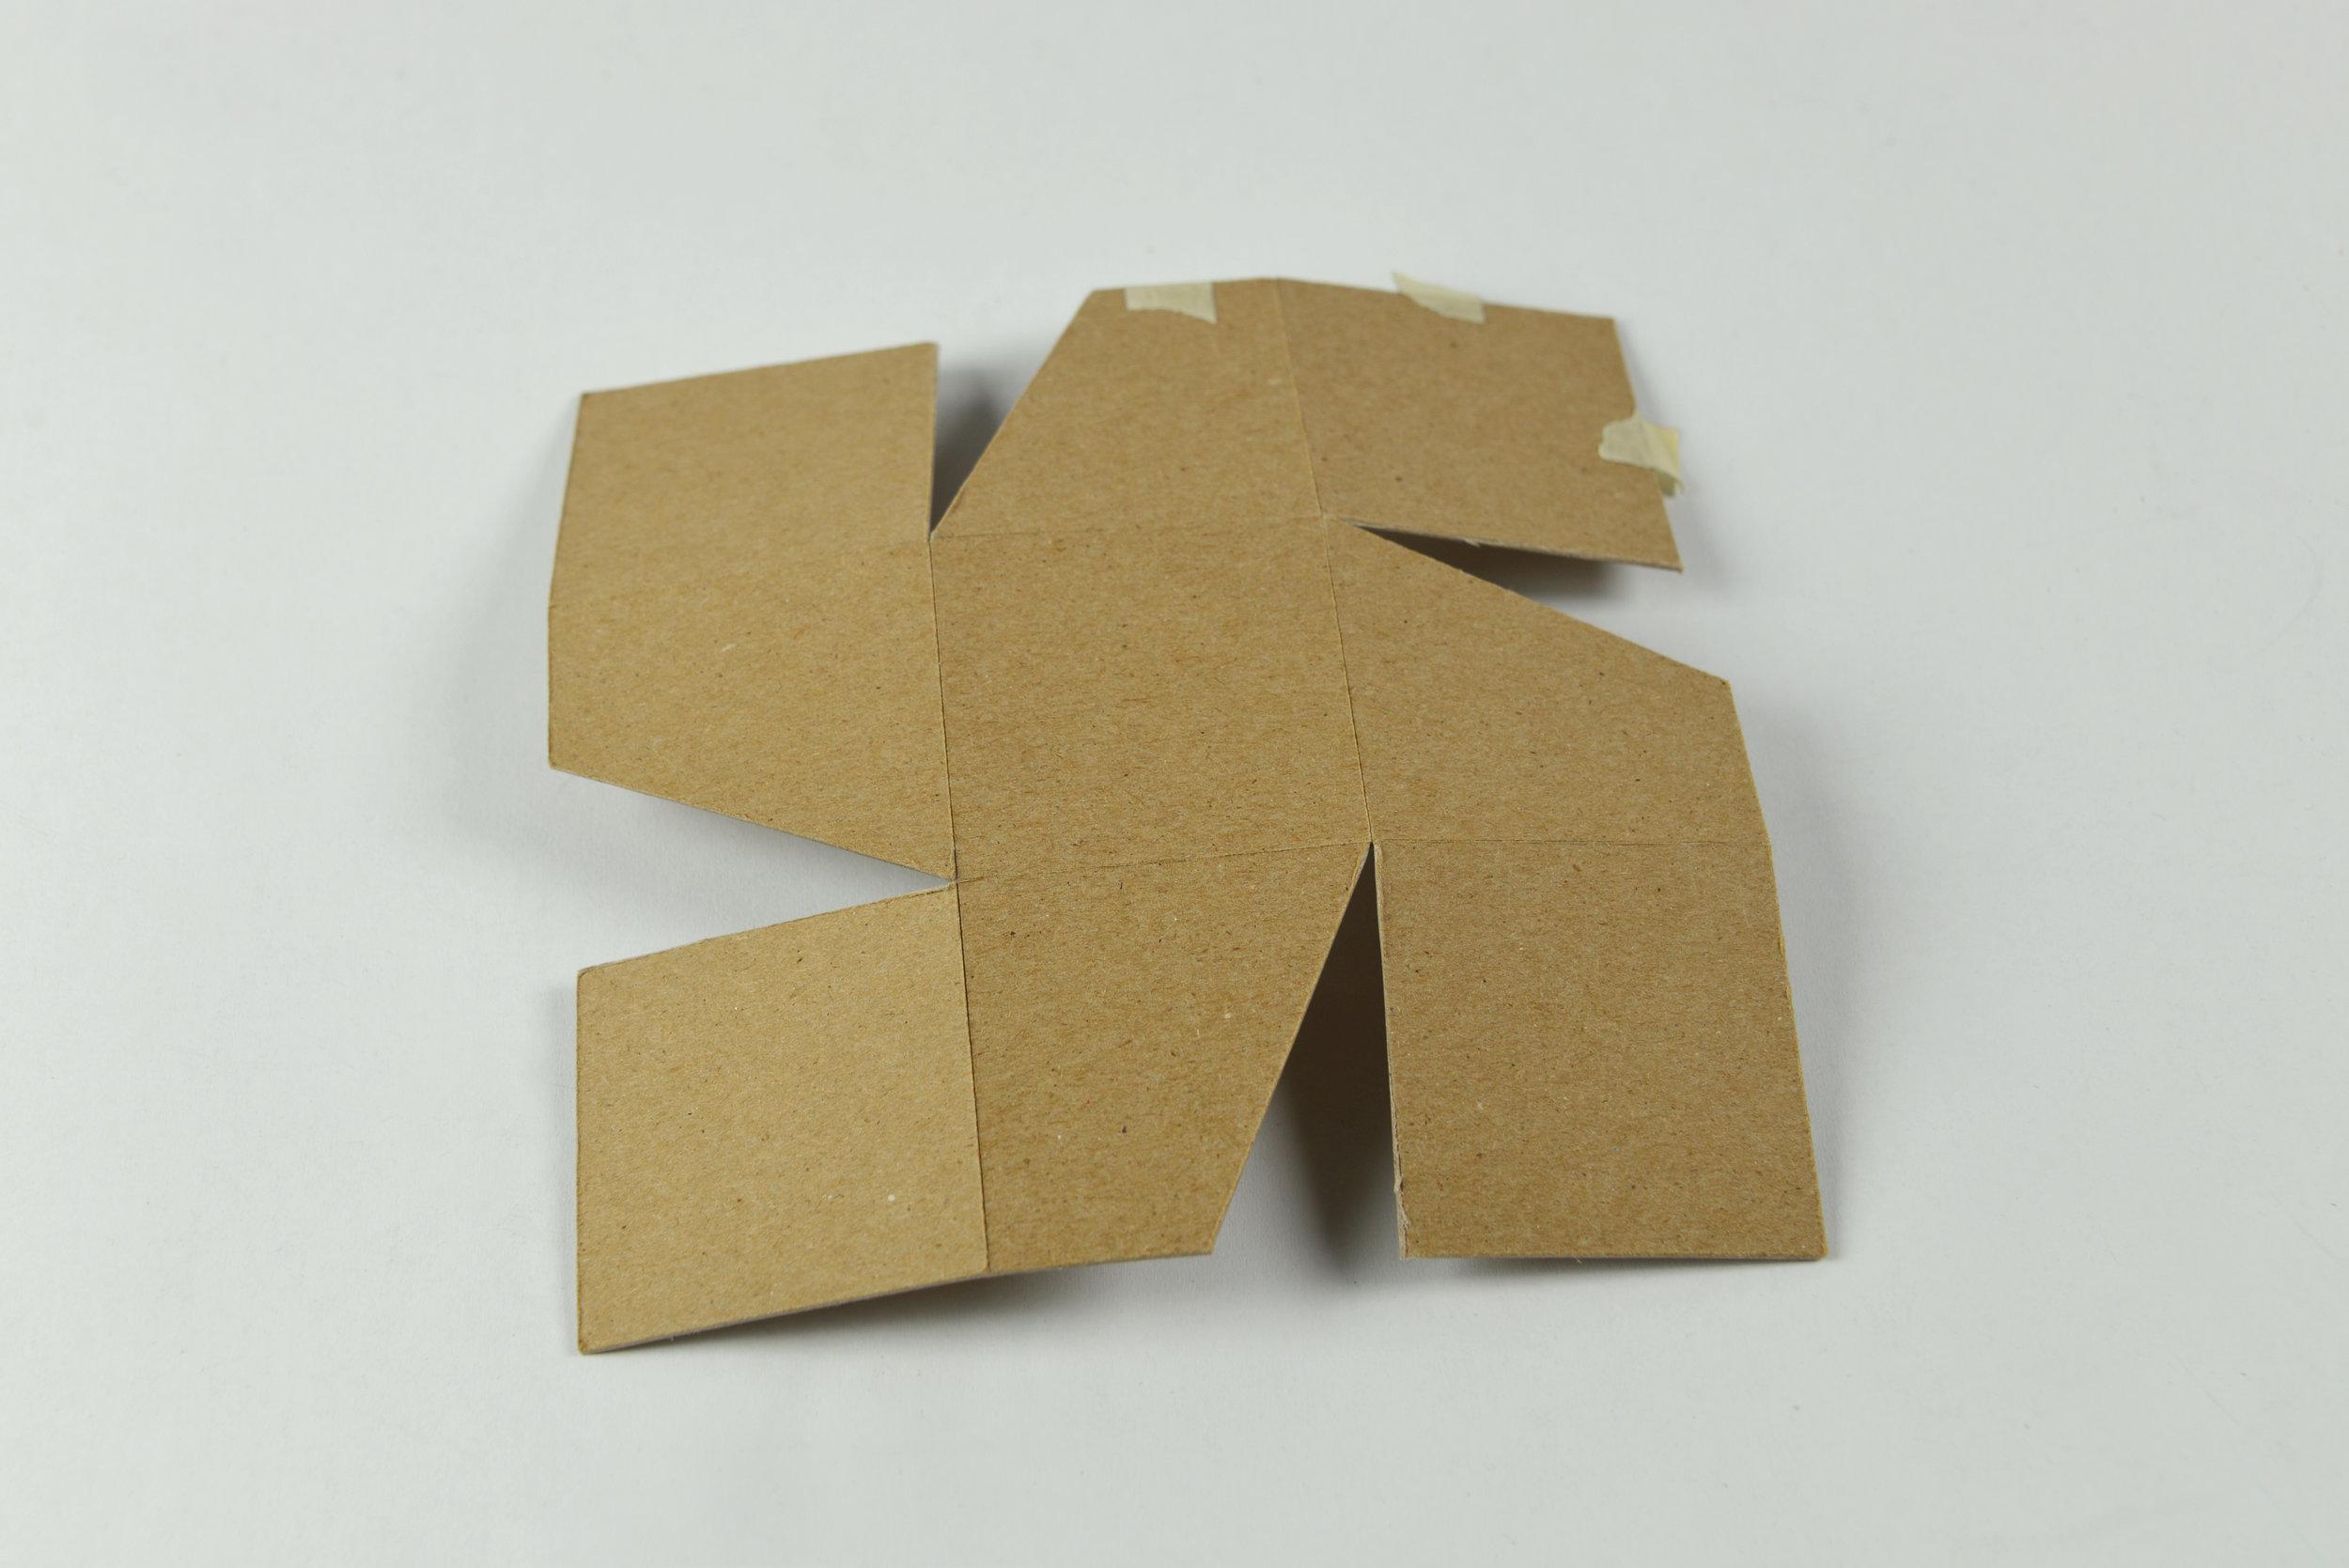 Cardboard Stool Small-Scale Prototype (2016)